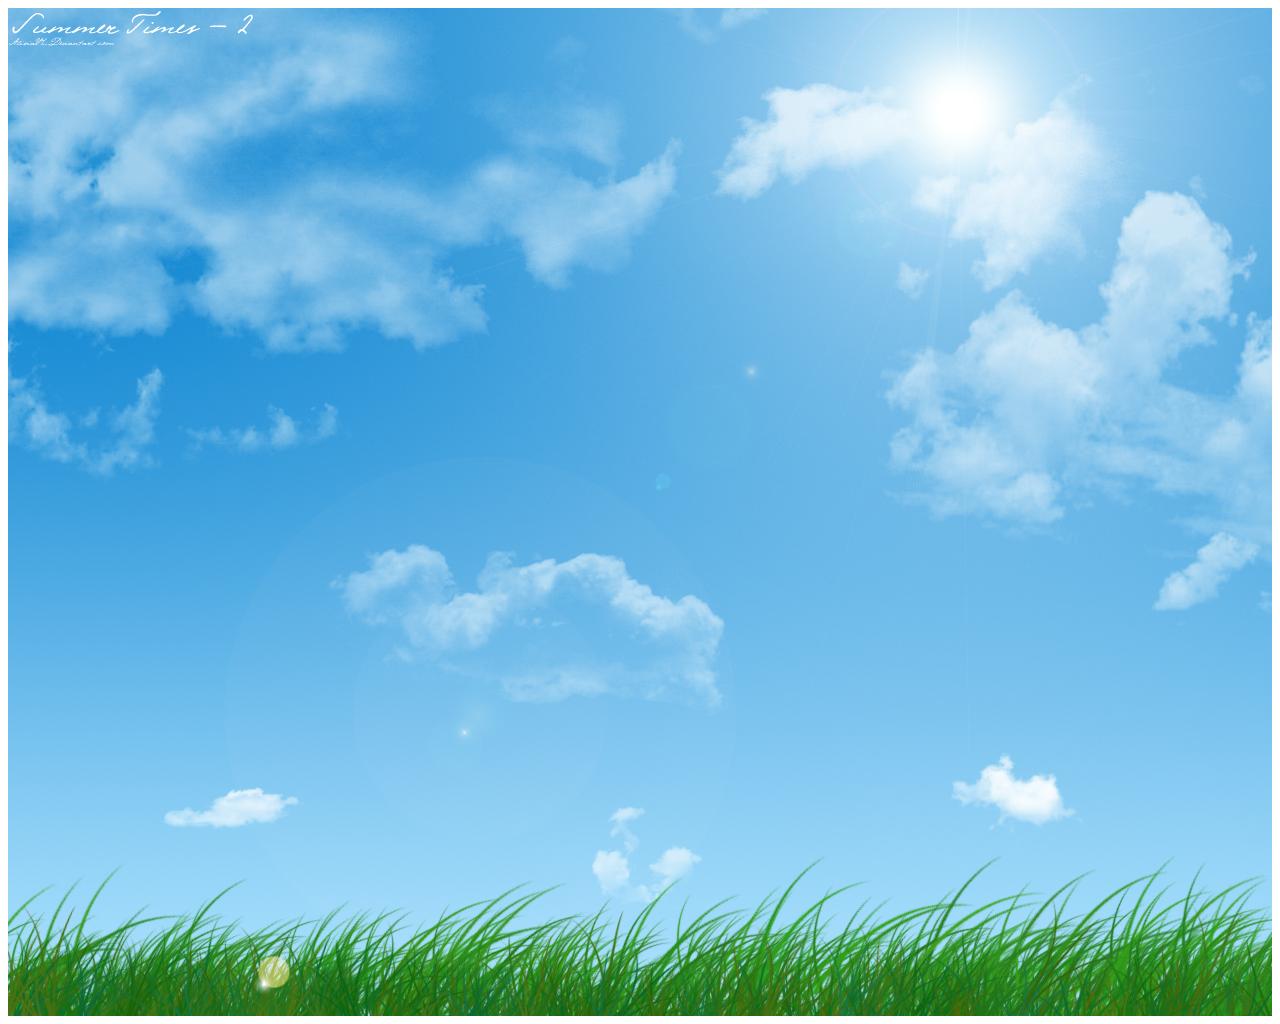 http://2.bp.blogspot.com/-Eix6Tr8BfAk/Tb-nuboF0tI/AAAAAAAAAXw/BUFOMsy_j8E/s1600/Summer_Times_by_pycc_wallpaper.jpg